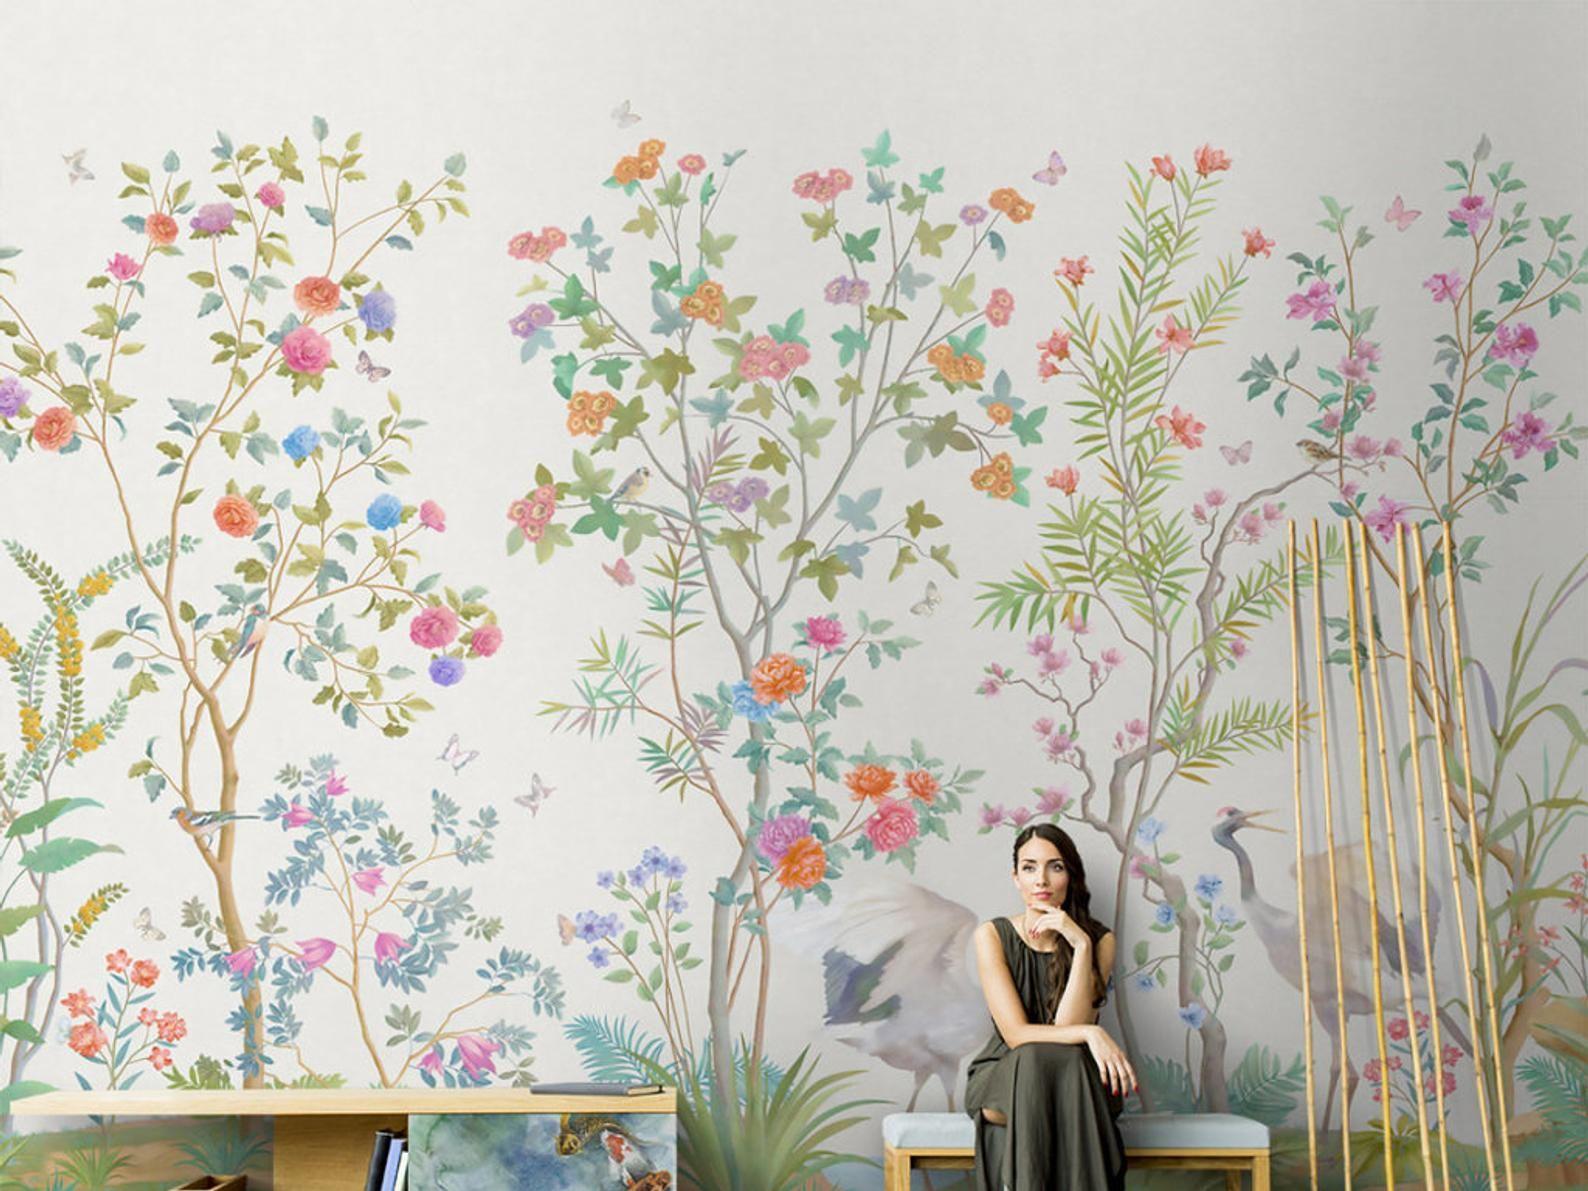 Hand Painted Wall Murals Flowers - HD Wallpaper